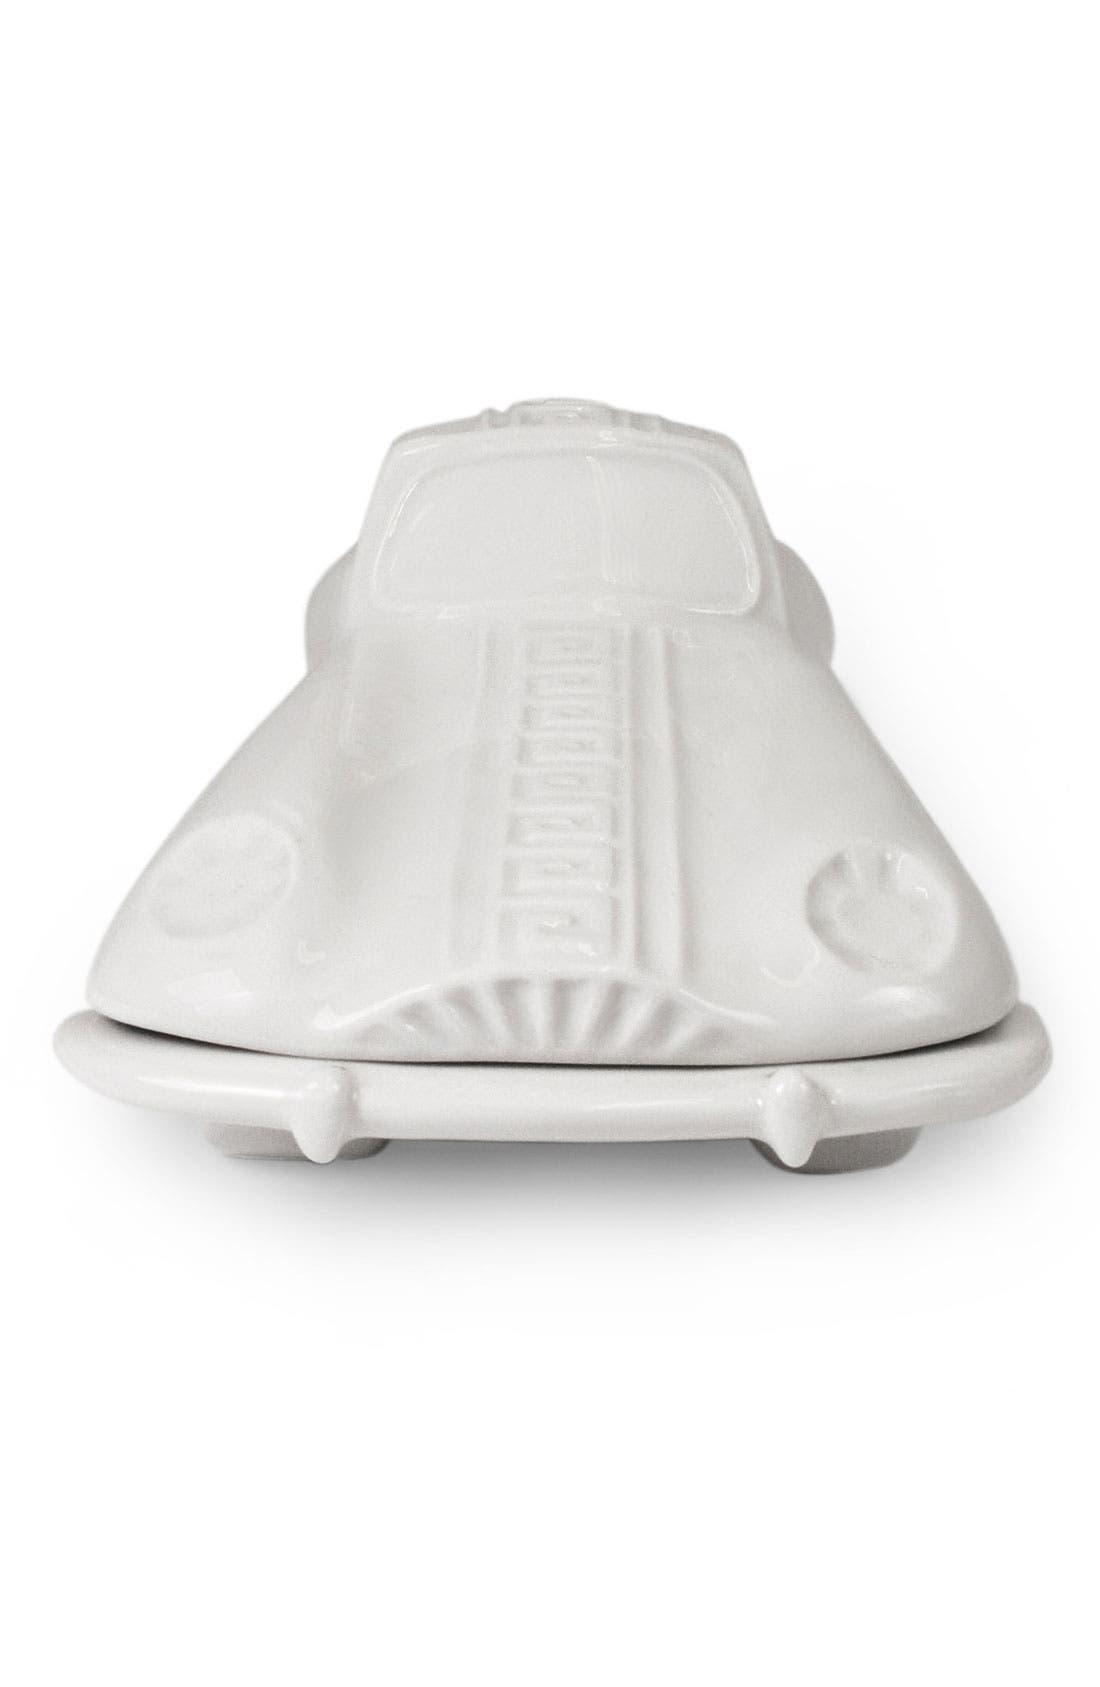 'Sports Car' Porcelain Box,                             Alternate thumbnail 2, color,